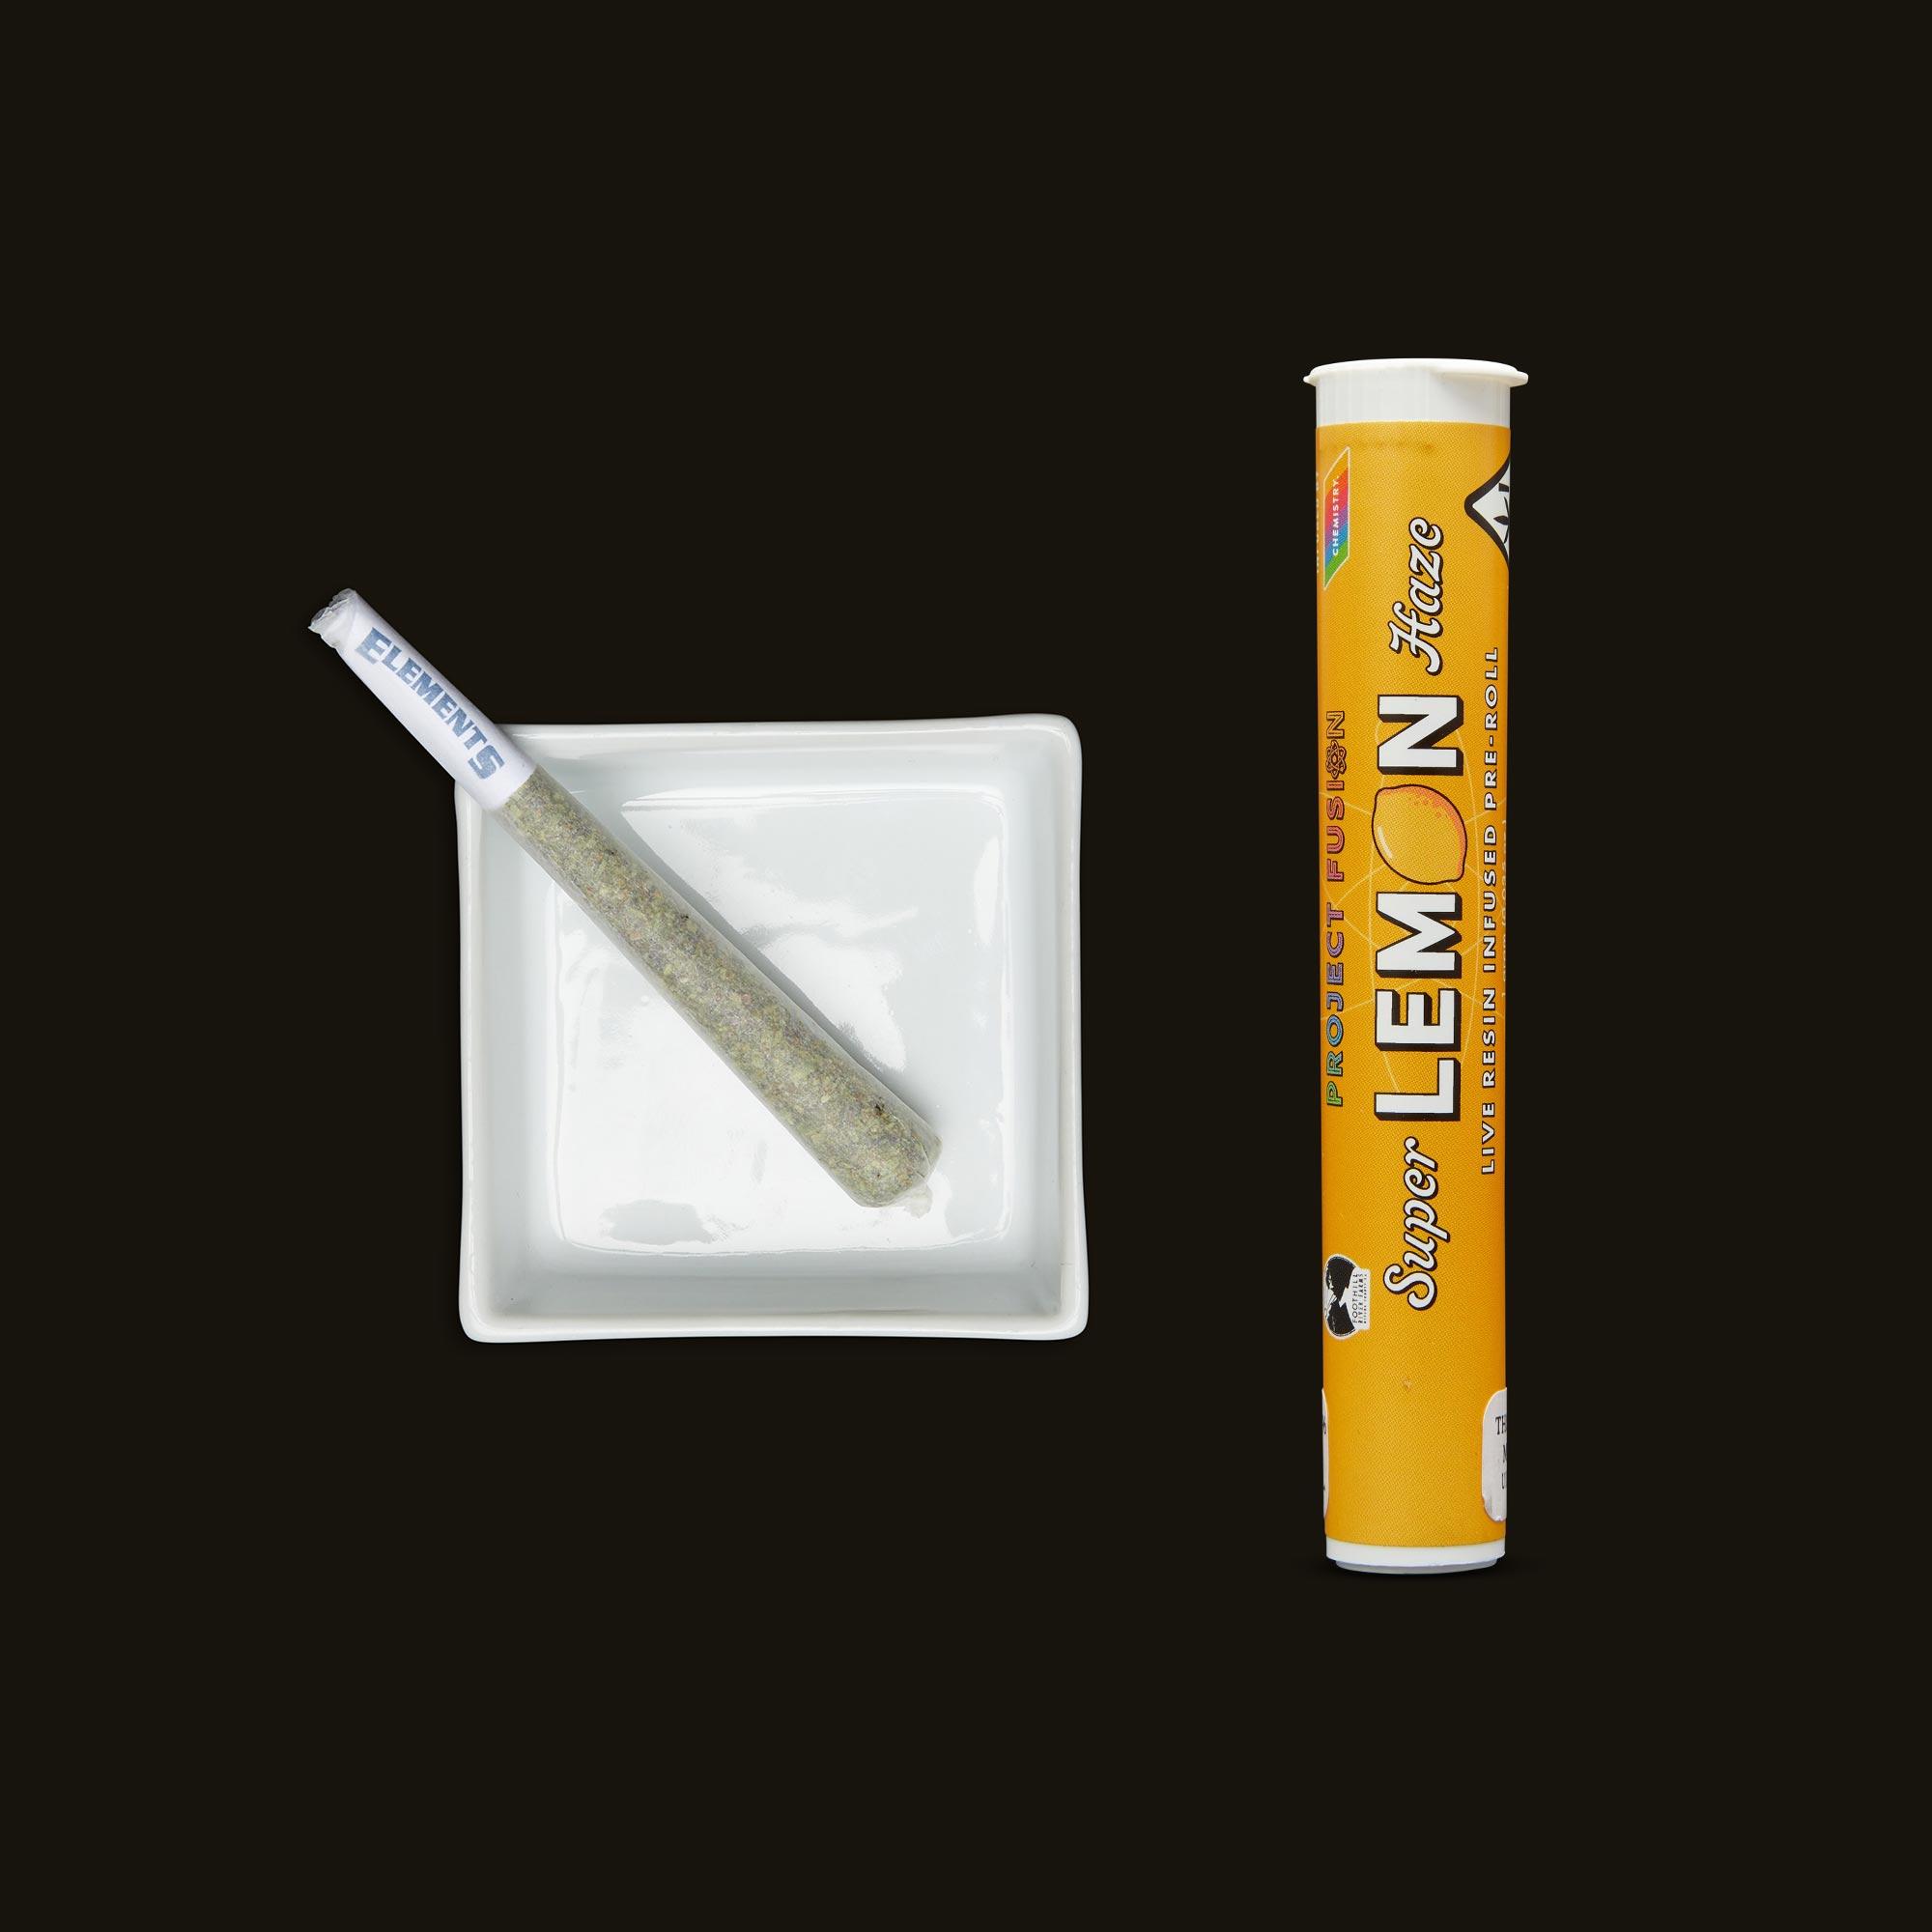 Chemistry Super Lemon Haze Live Resin Infused Pre-Roll